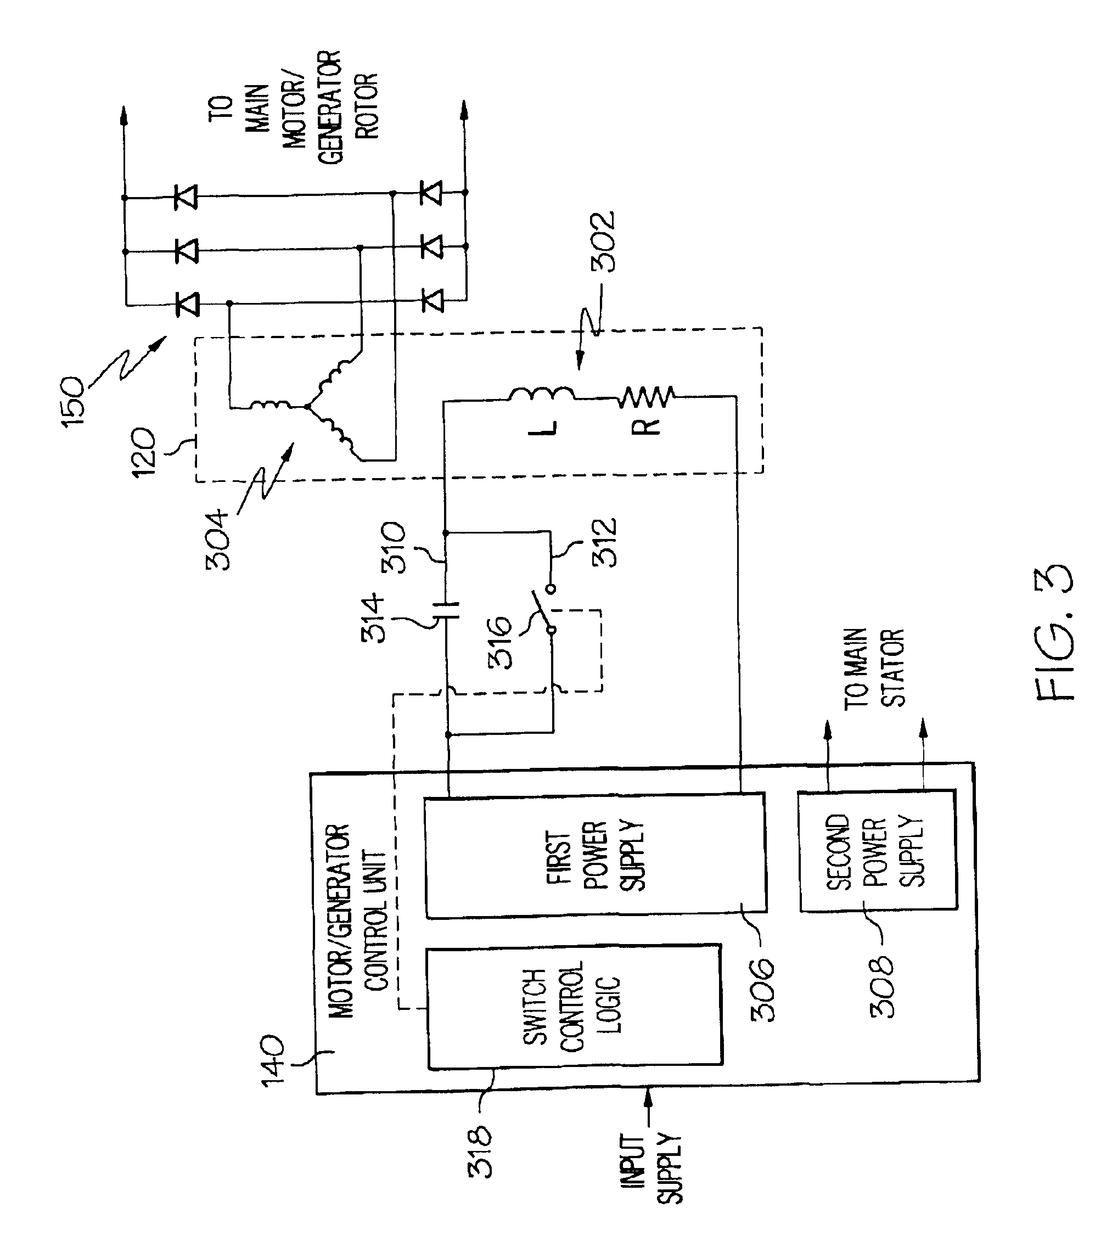 Circuits Drawing at GetDrawings.com | Free for personal use Circuits ...